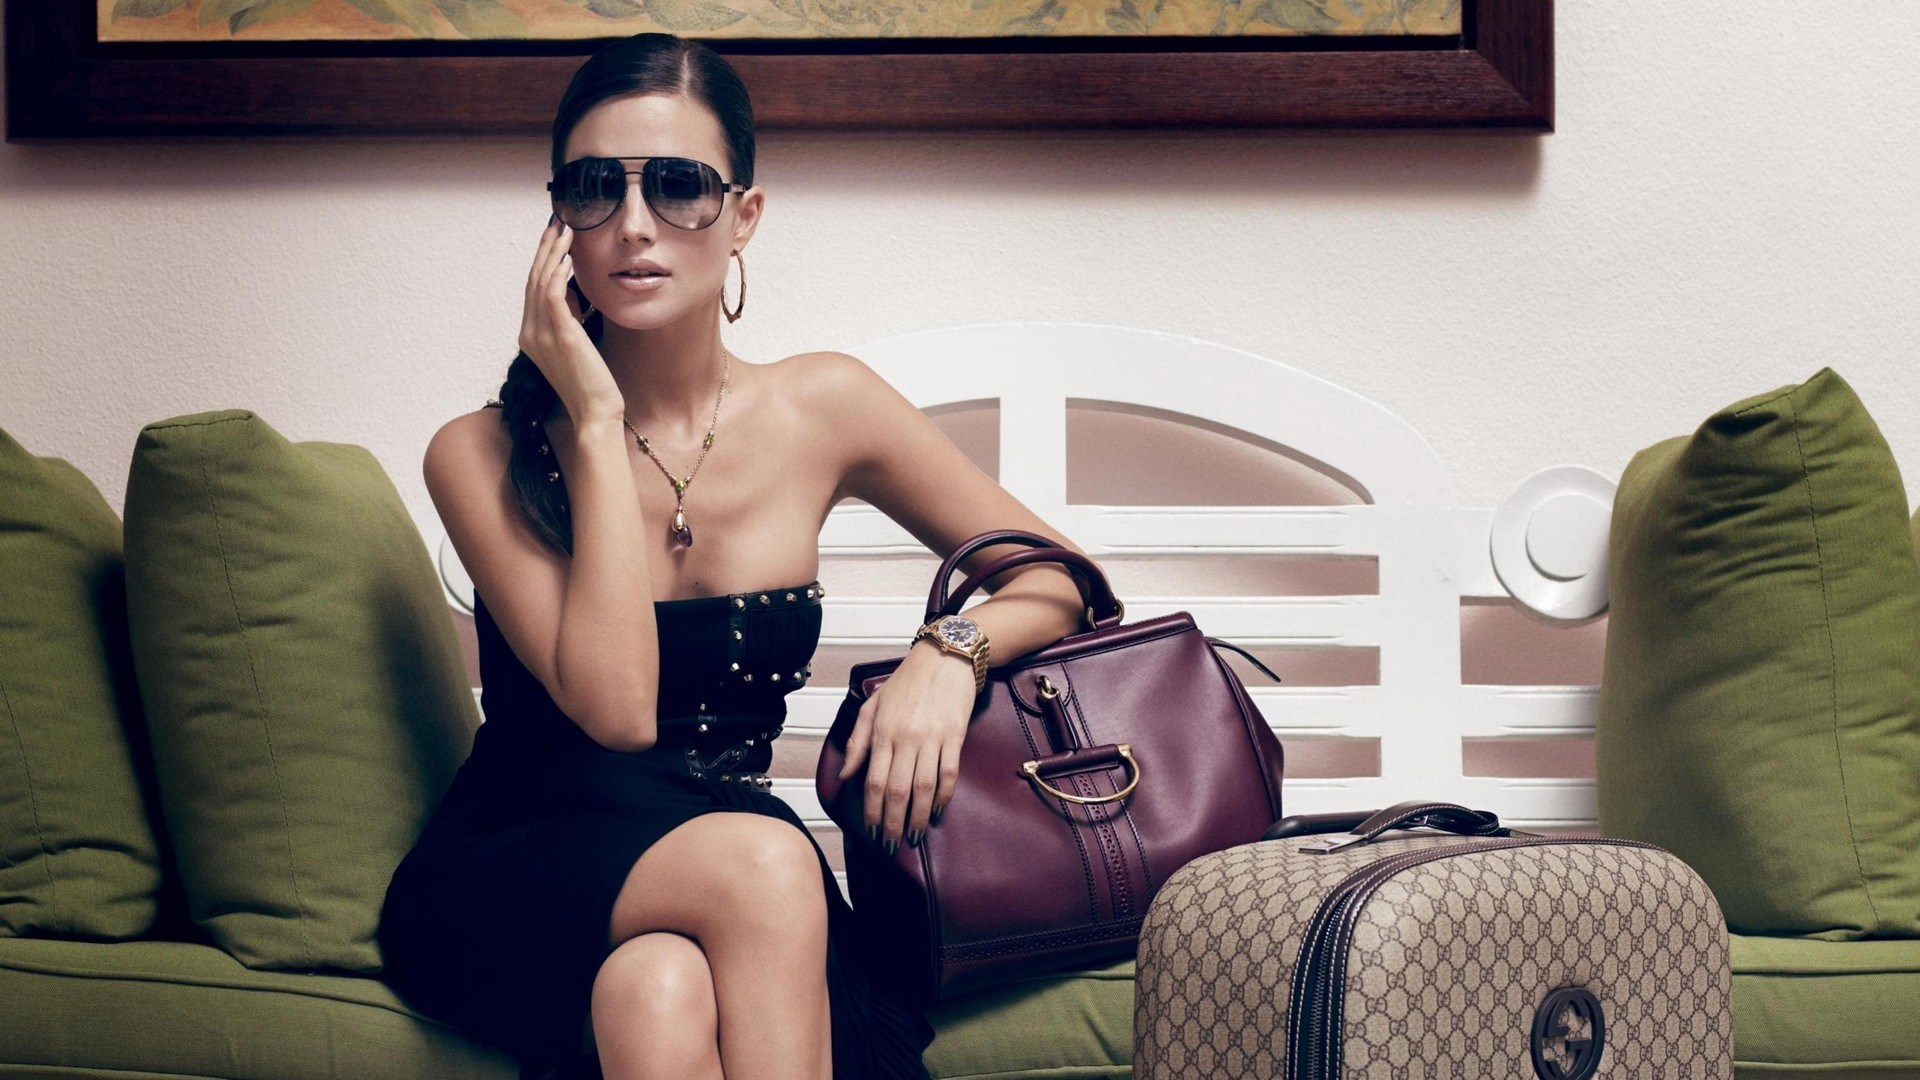 Rezultat iskanja slik za women bags wallpaper